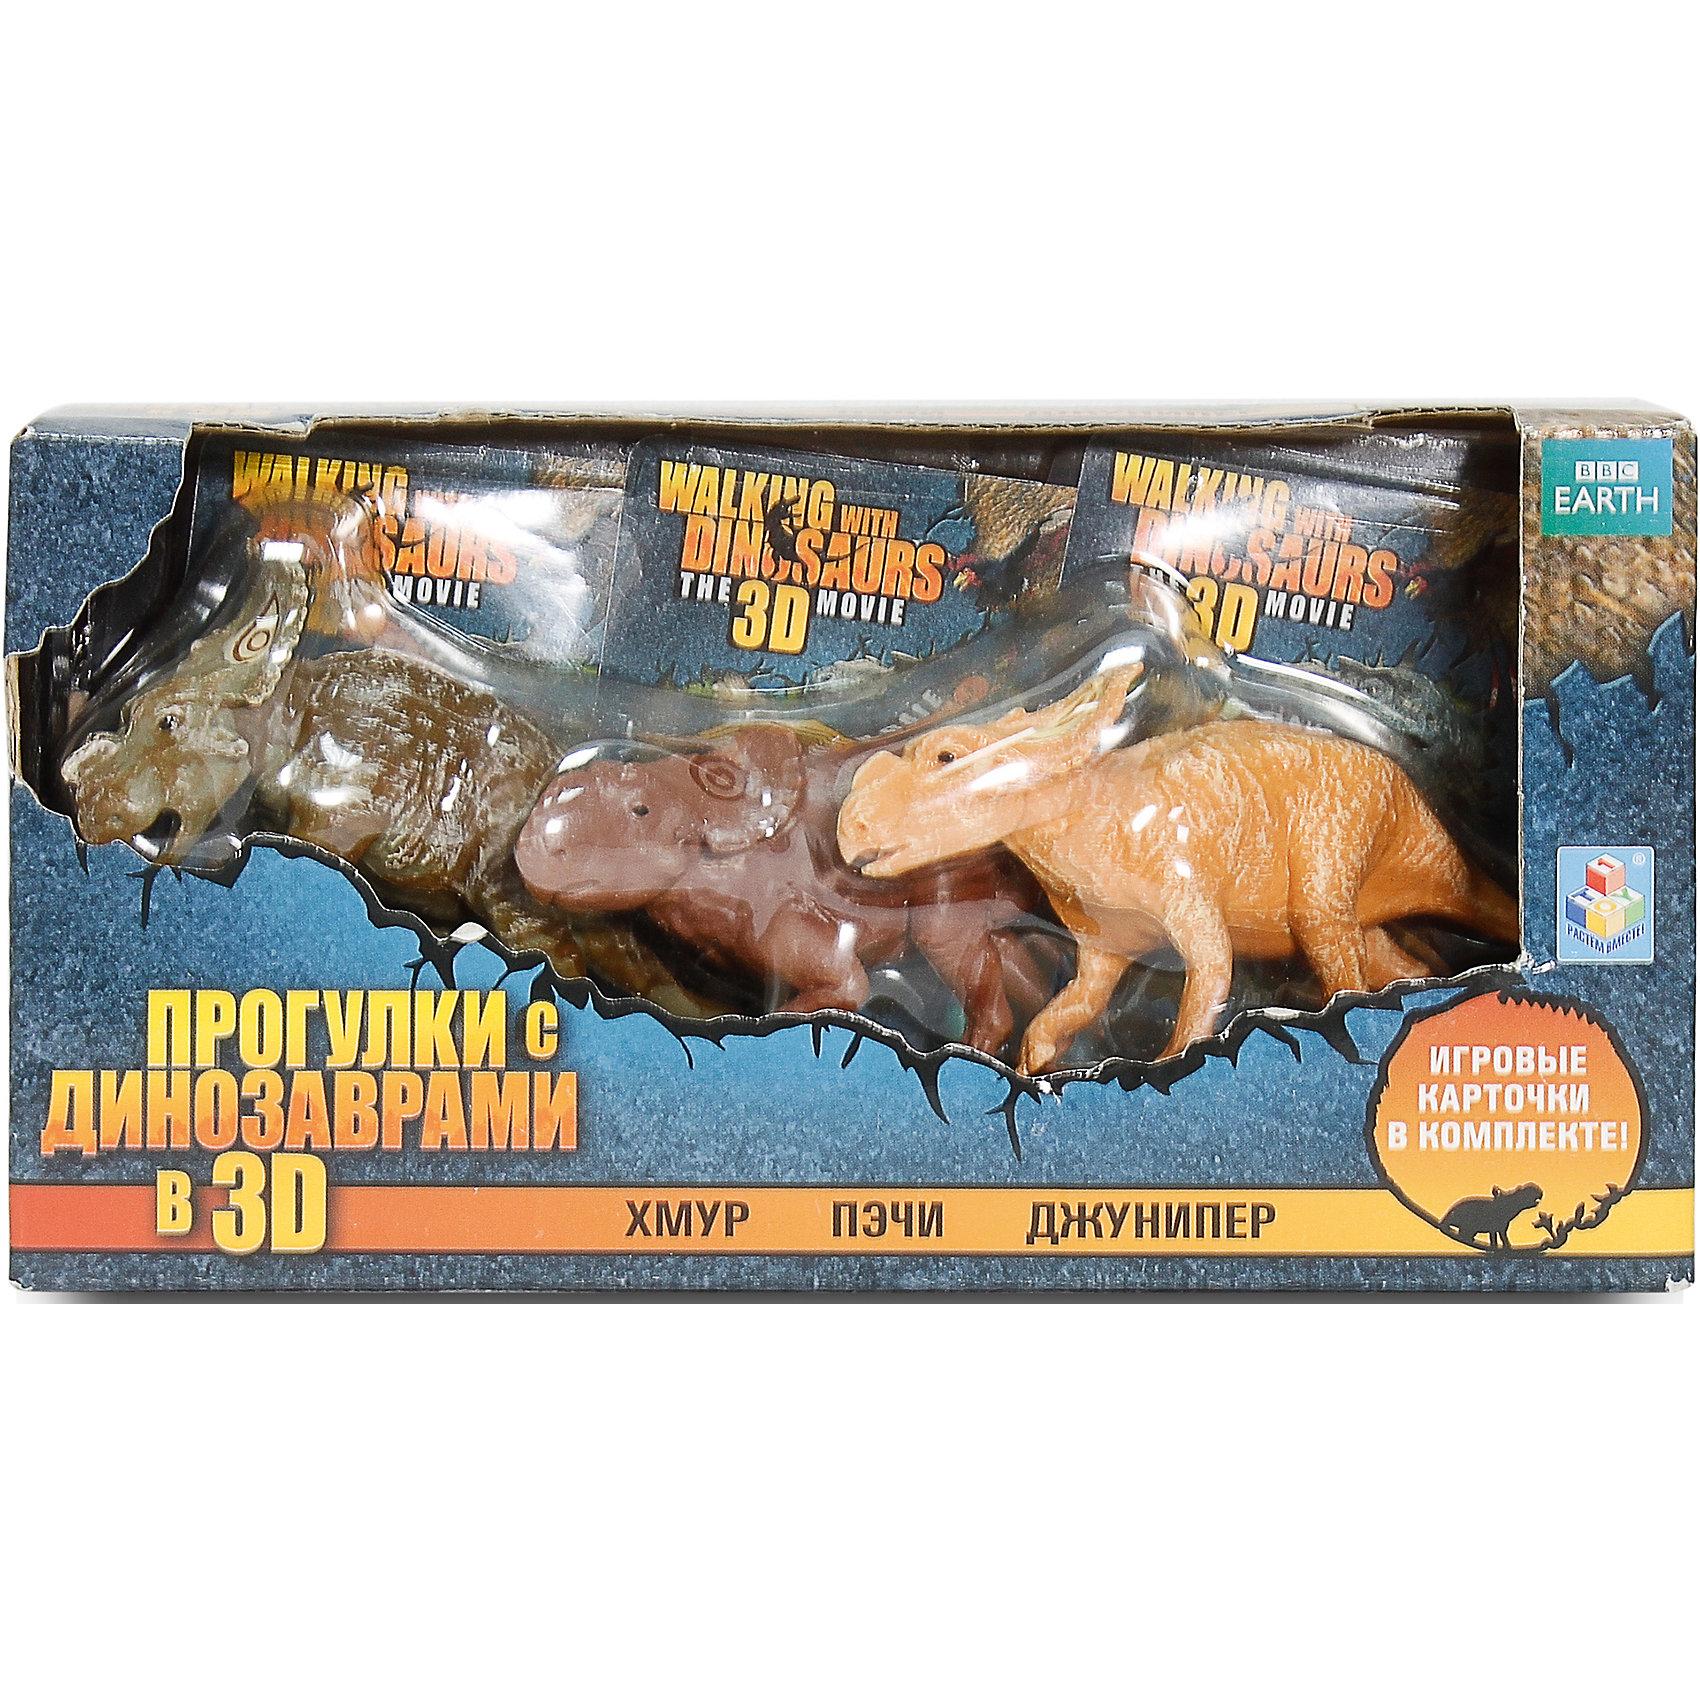 Набор фигурок Прогулки с динозаврами 3D, 1toy<br><br>Ширина мм: 180<br>Глубина мм: 40<br>Высота мм: 90<br>Вес г: 155<br>Возраст от месяцев: 36<br>Возраст до месяцев: 144<br>Пол: Мужской<br>Возраст: Детский<br>SKU: 4767359